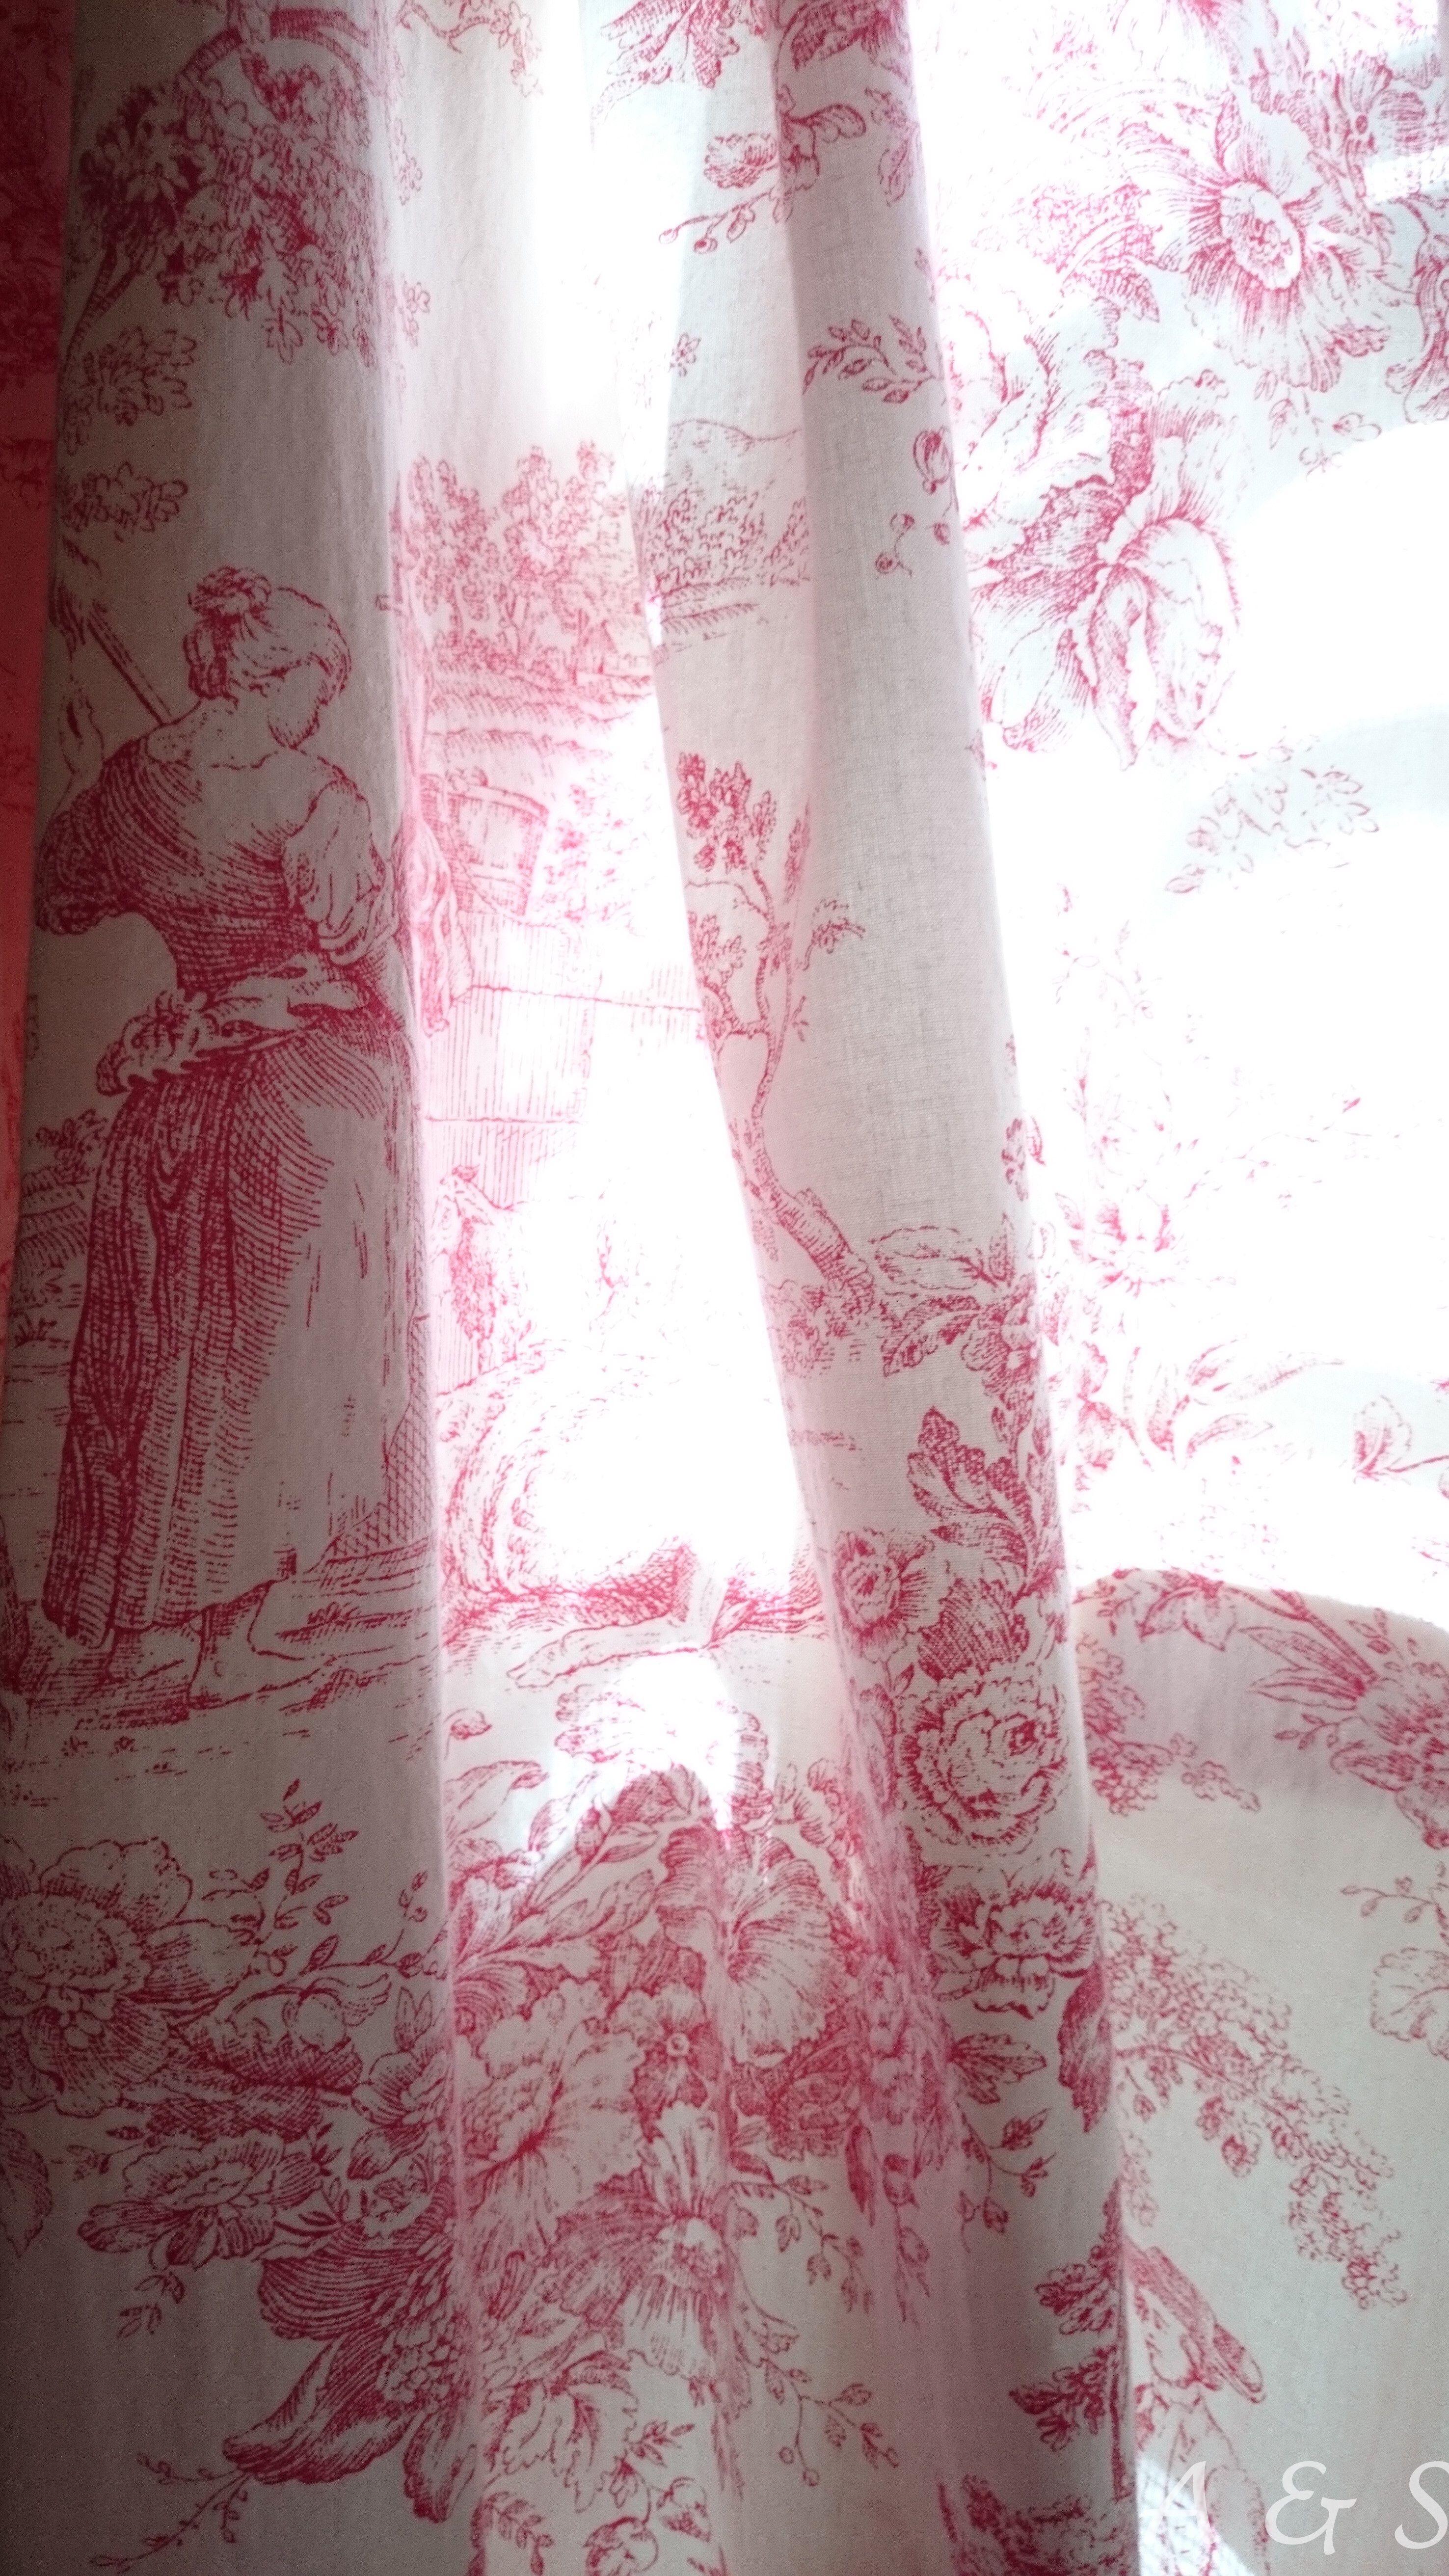 Pink Toile Curtains Toile Curtains Red Toile Curtains Curtains